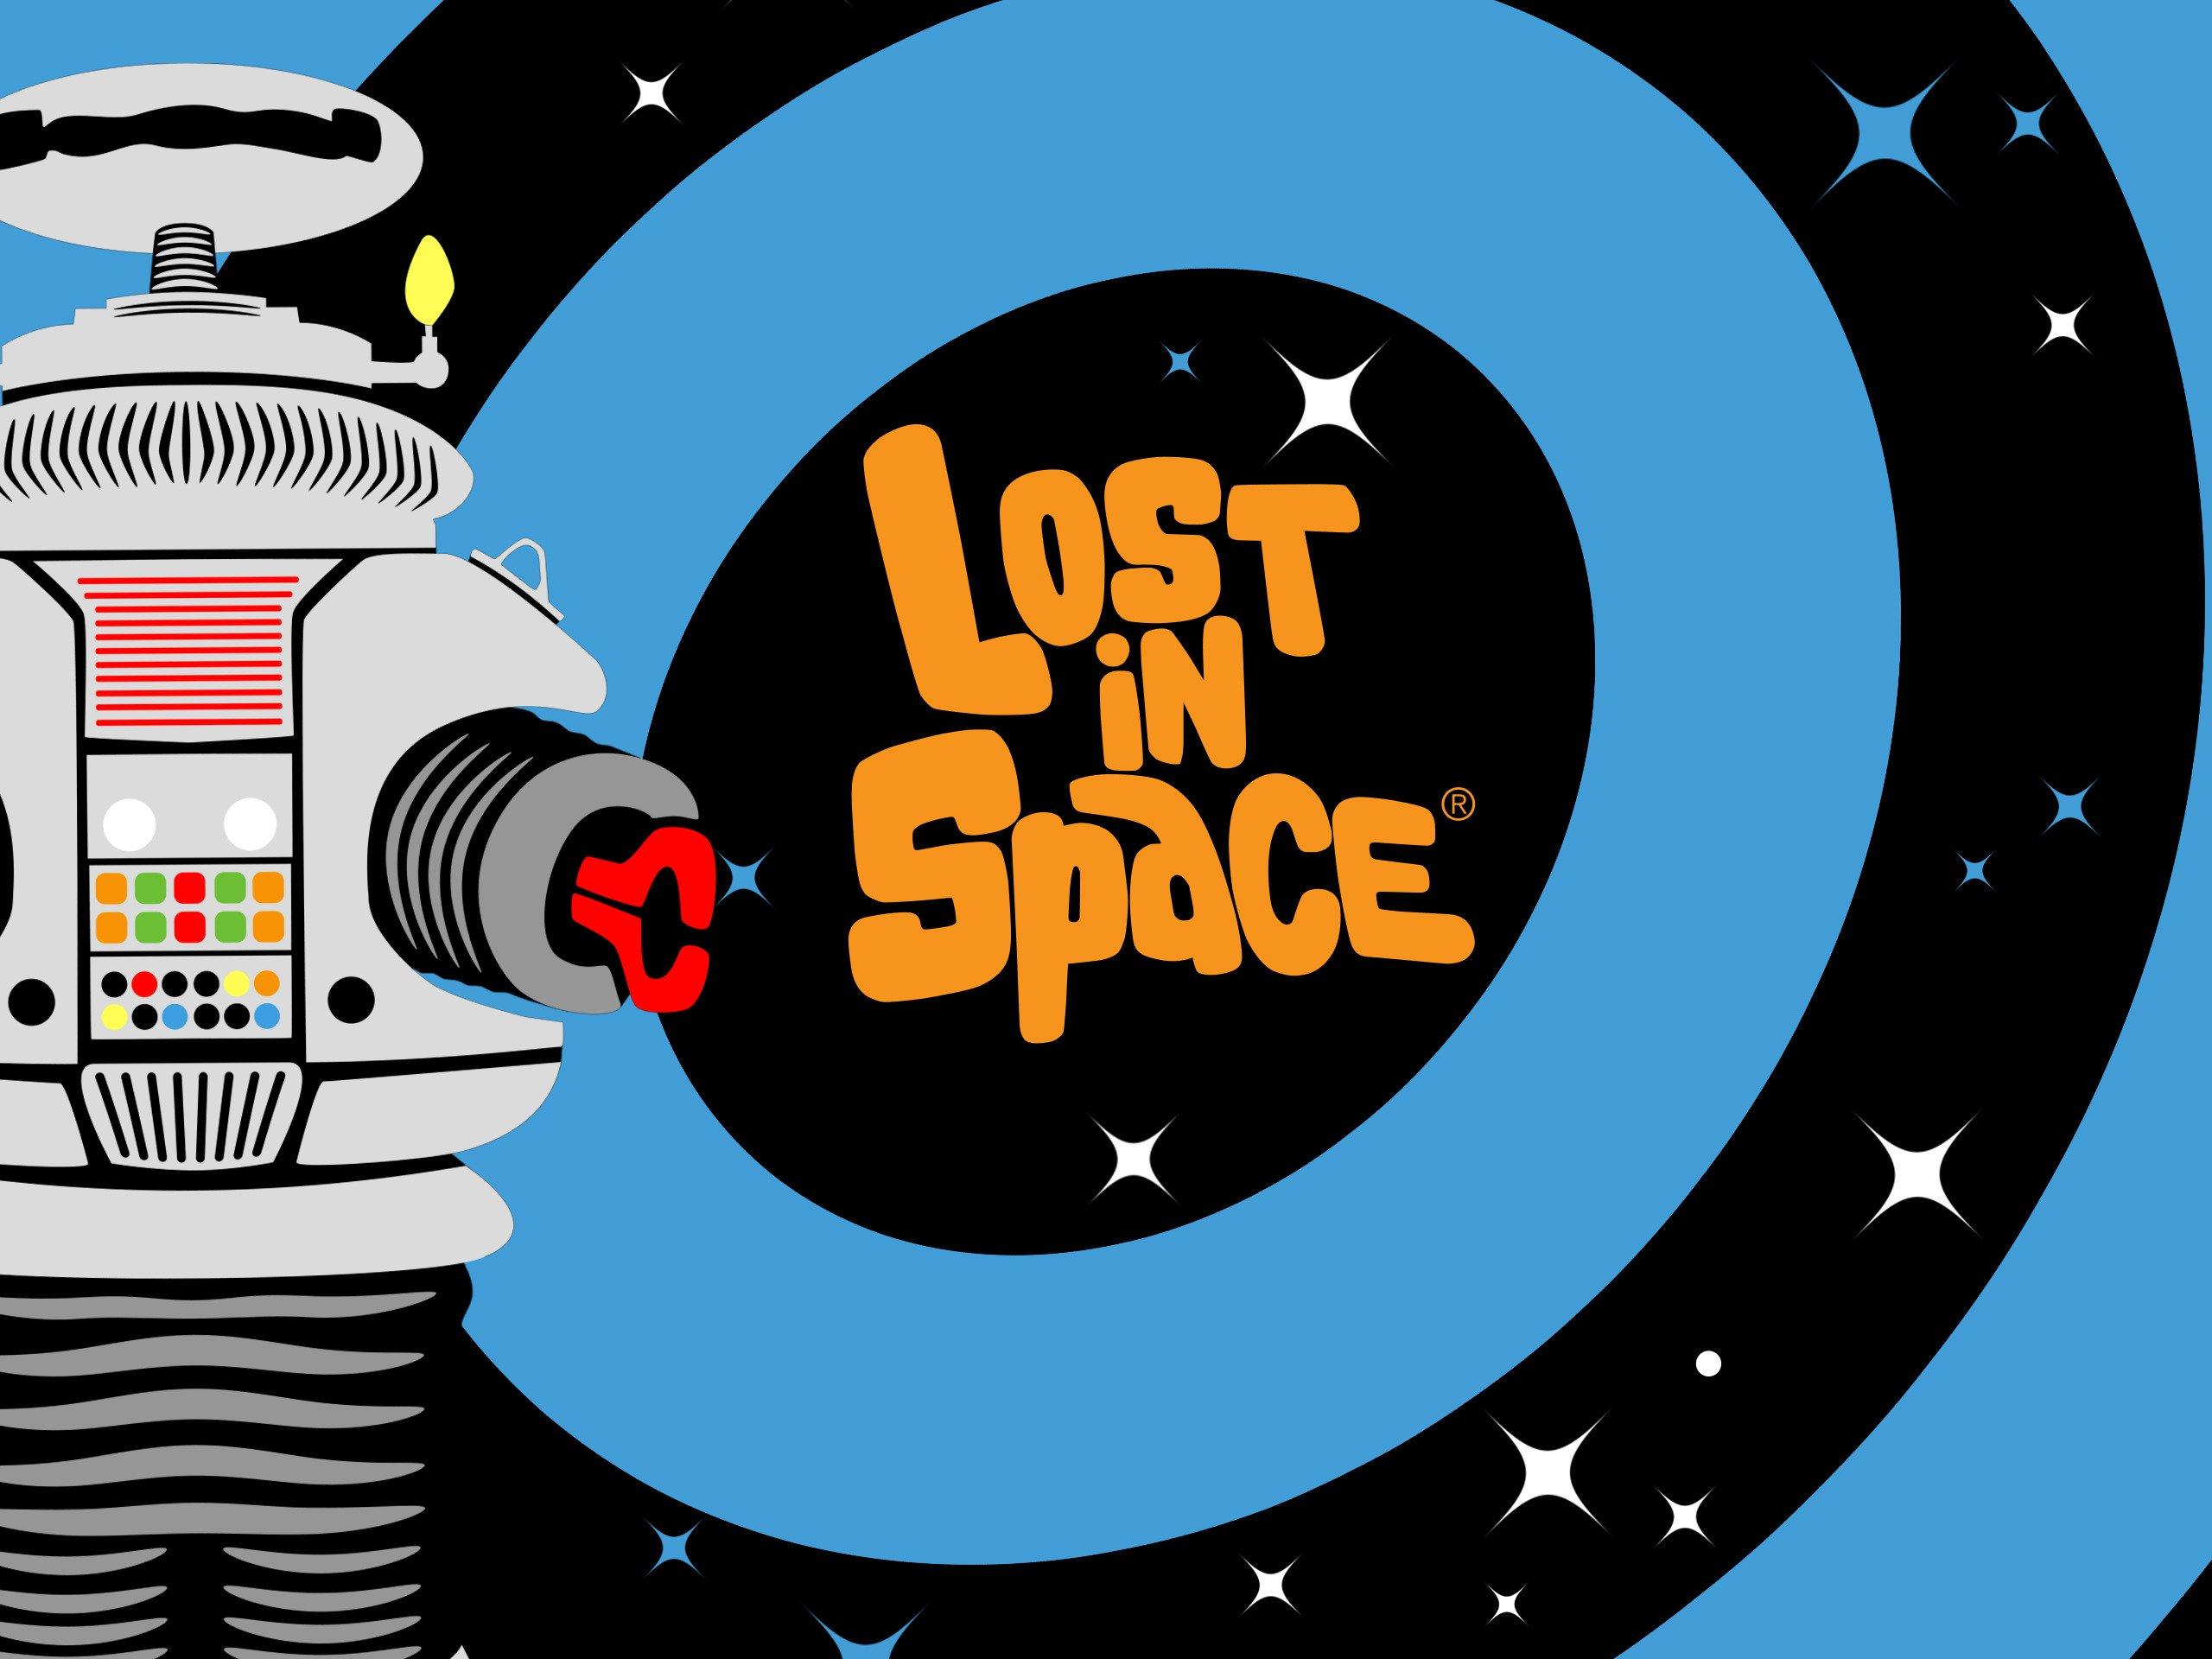 lost in space season 1 torrent